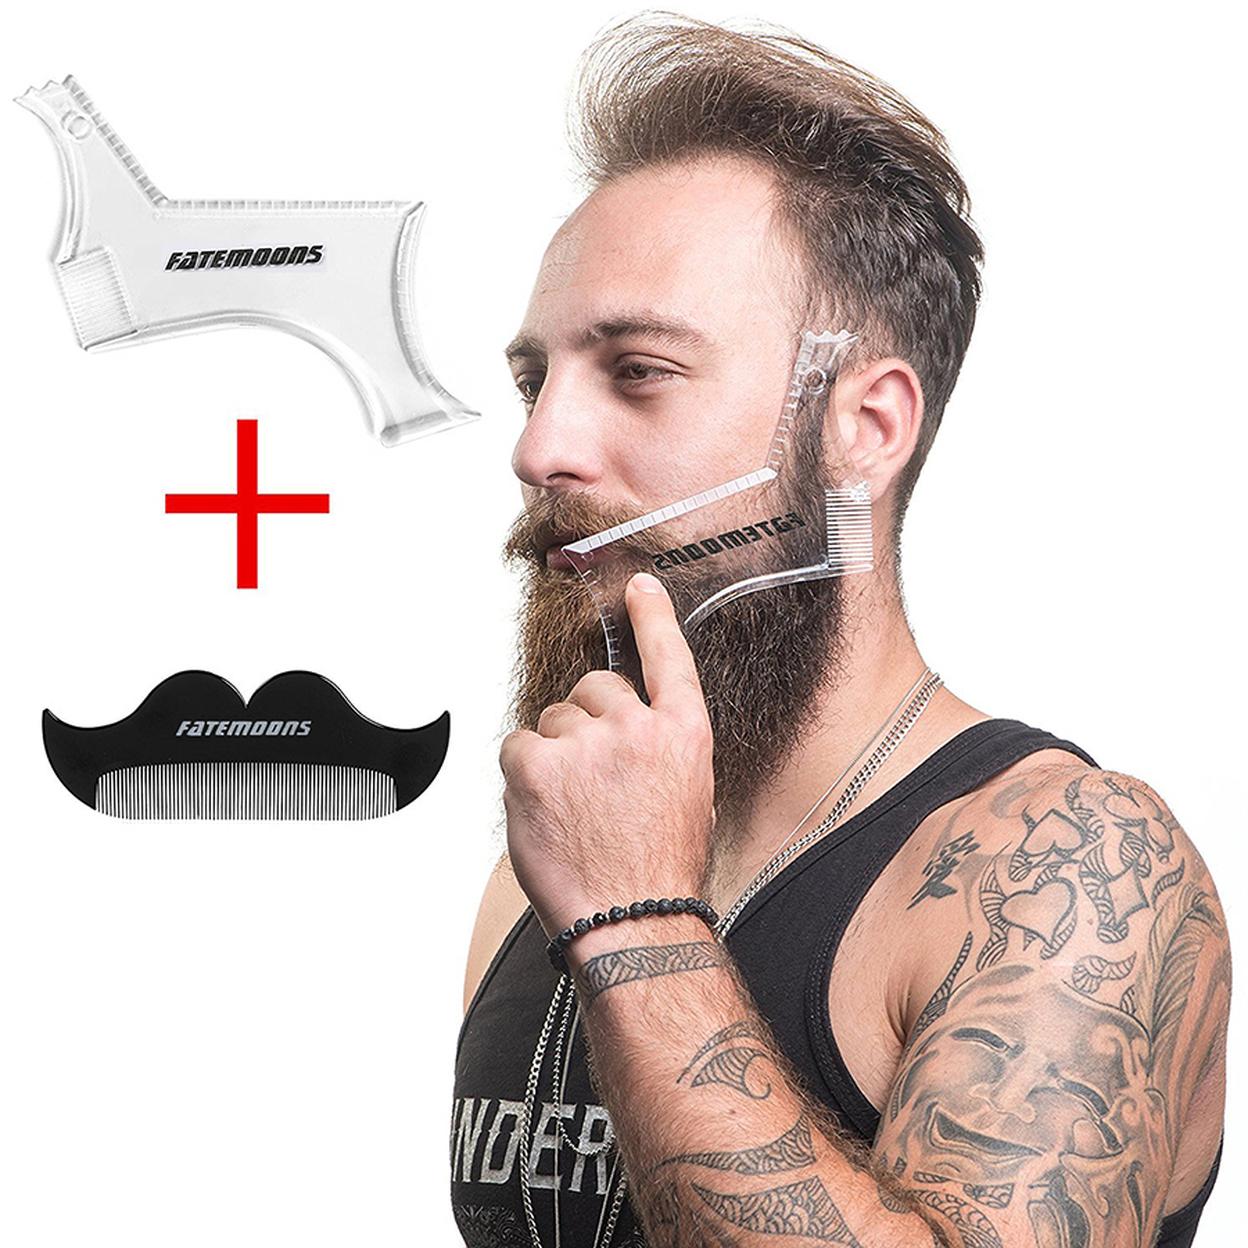 Beard Shaping Tool Template Perfect Hairline Perfect Symmetrical Multi-curve Beard Mustard Flexible Tool with Free Beard Comb 59e5c2155078a8698b0f1915